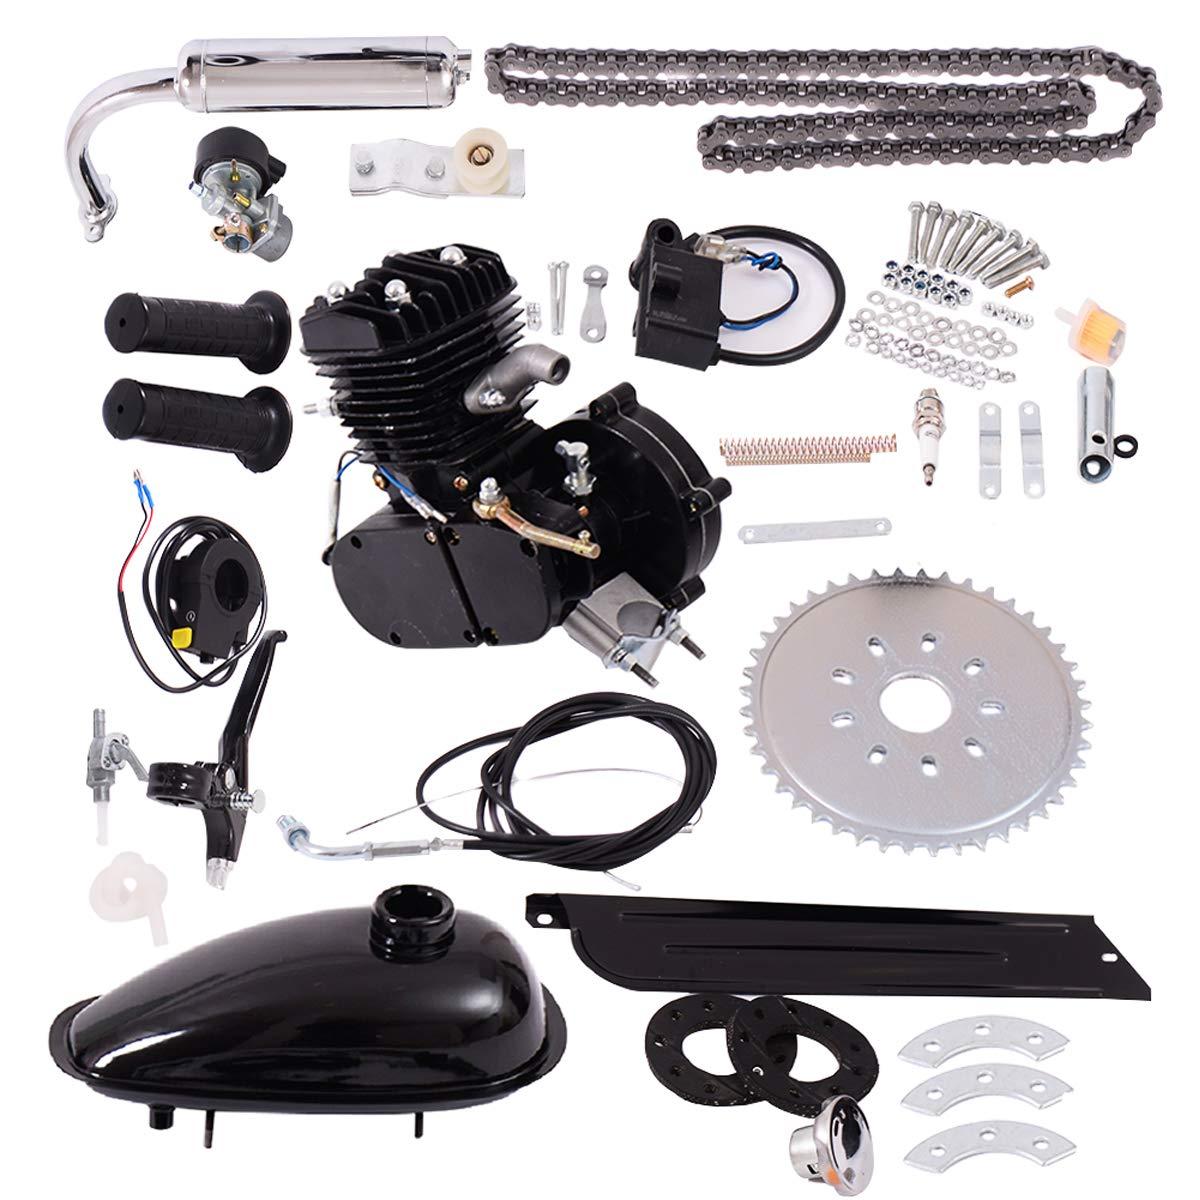 Bicycle Motor Kit 80cc 2-Stroke Bike Gasoline Motorized Gas Engine Bike  Motor Kit